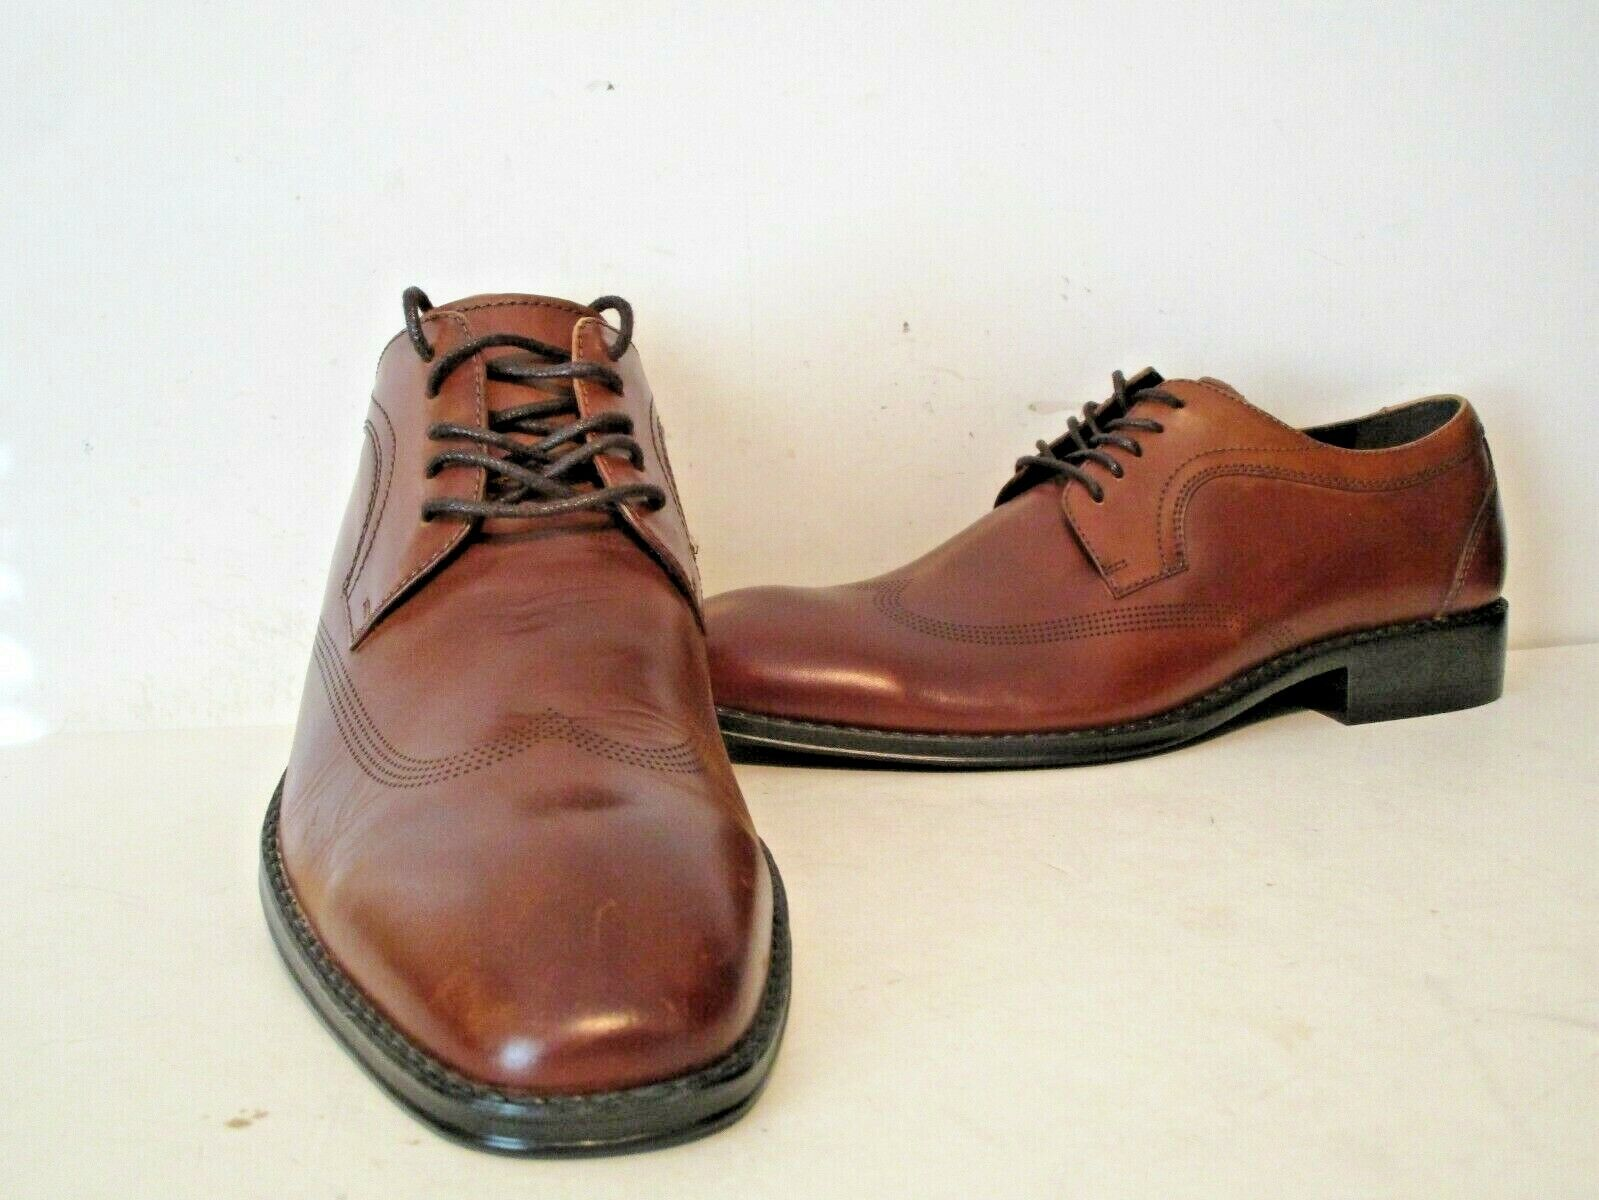 Kenneth Cole Reaction Mens Reason Casual Dress Oxford Shoes Cognac Size 7 M